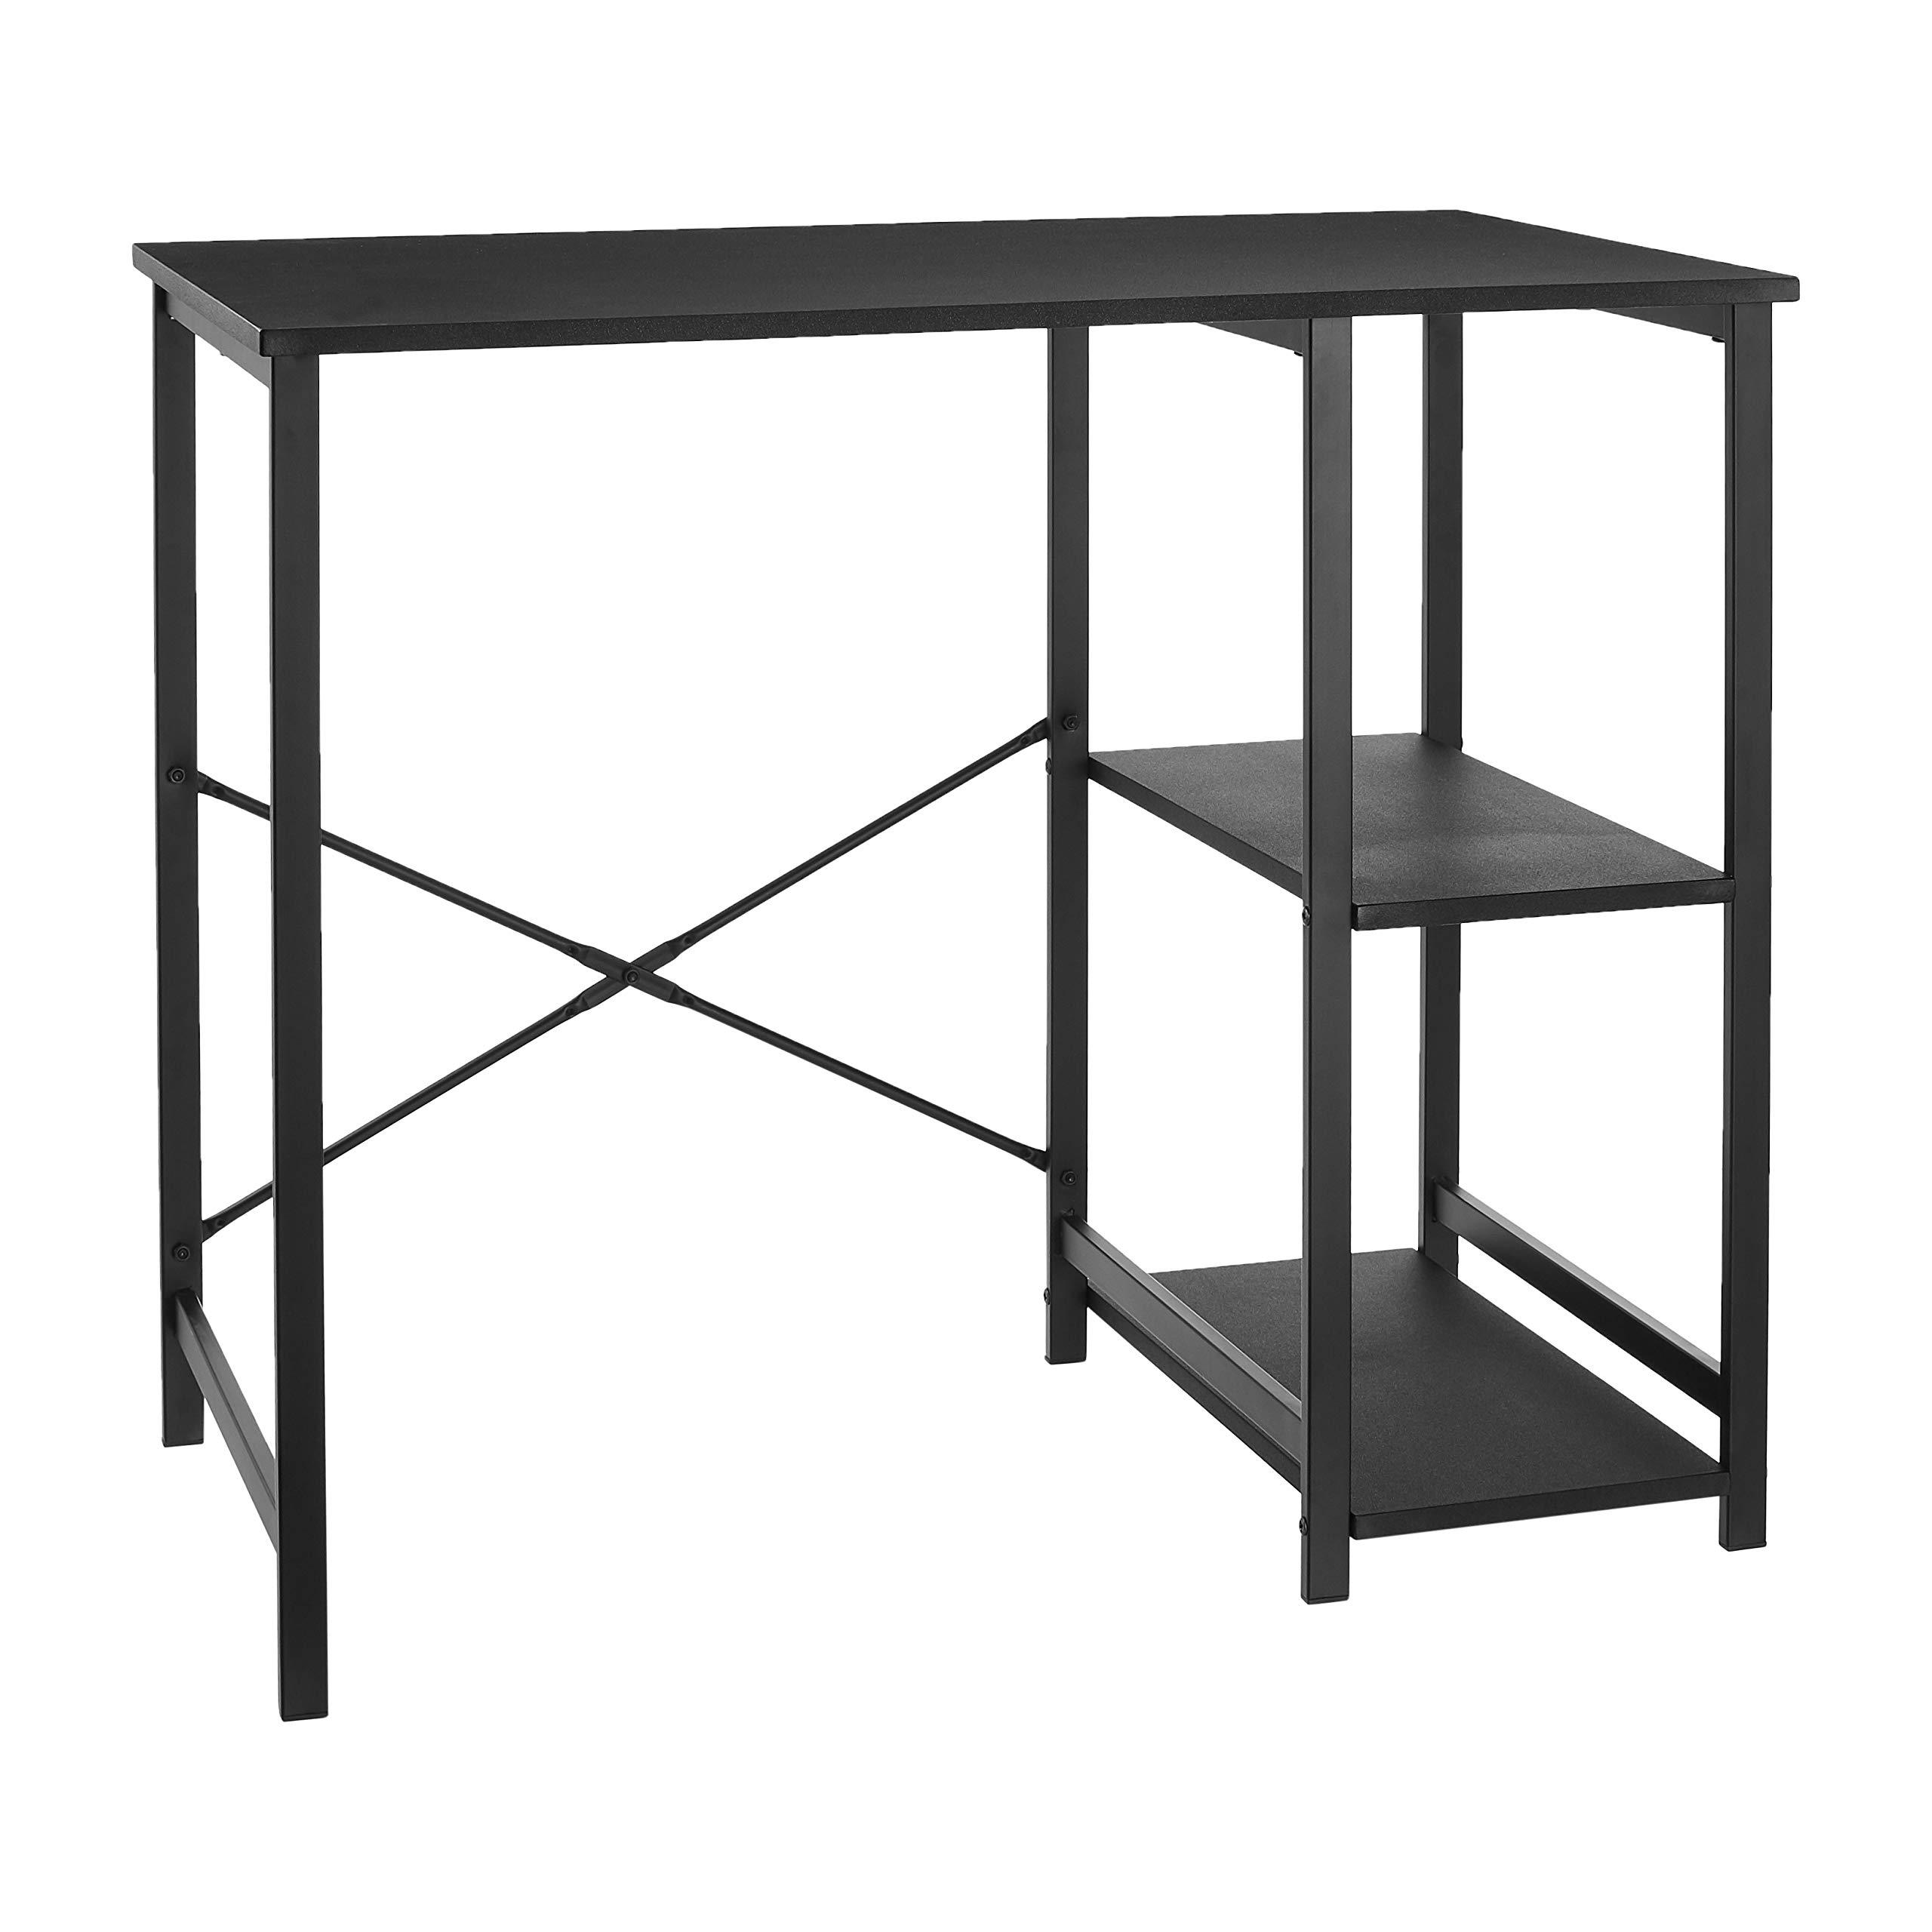 AmazonBasics Classic Computer Desk With Shelves - Black by AmazonBasics